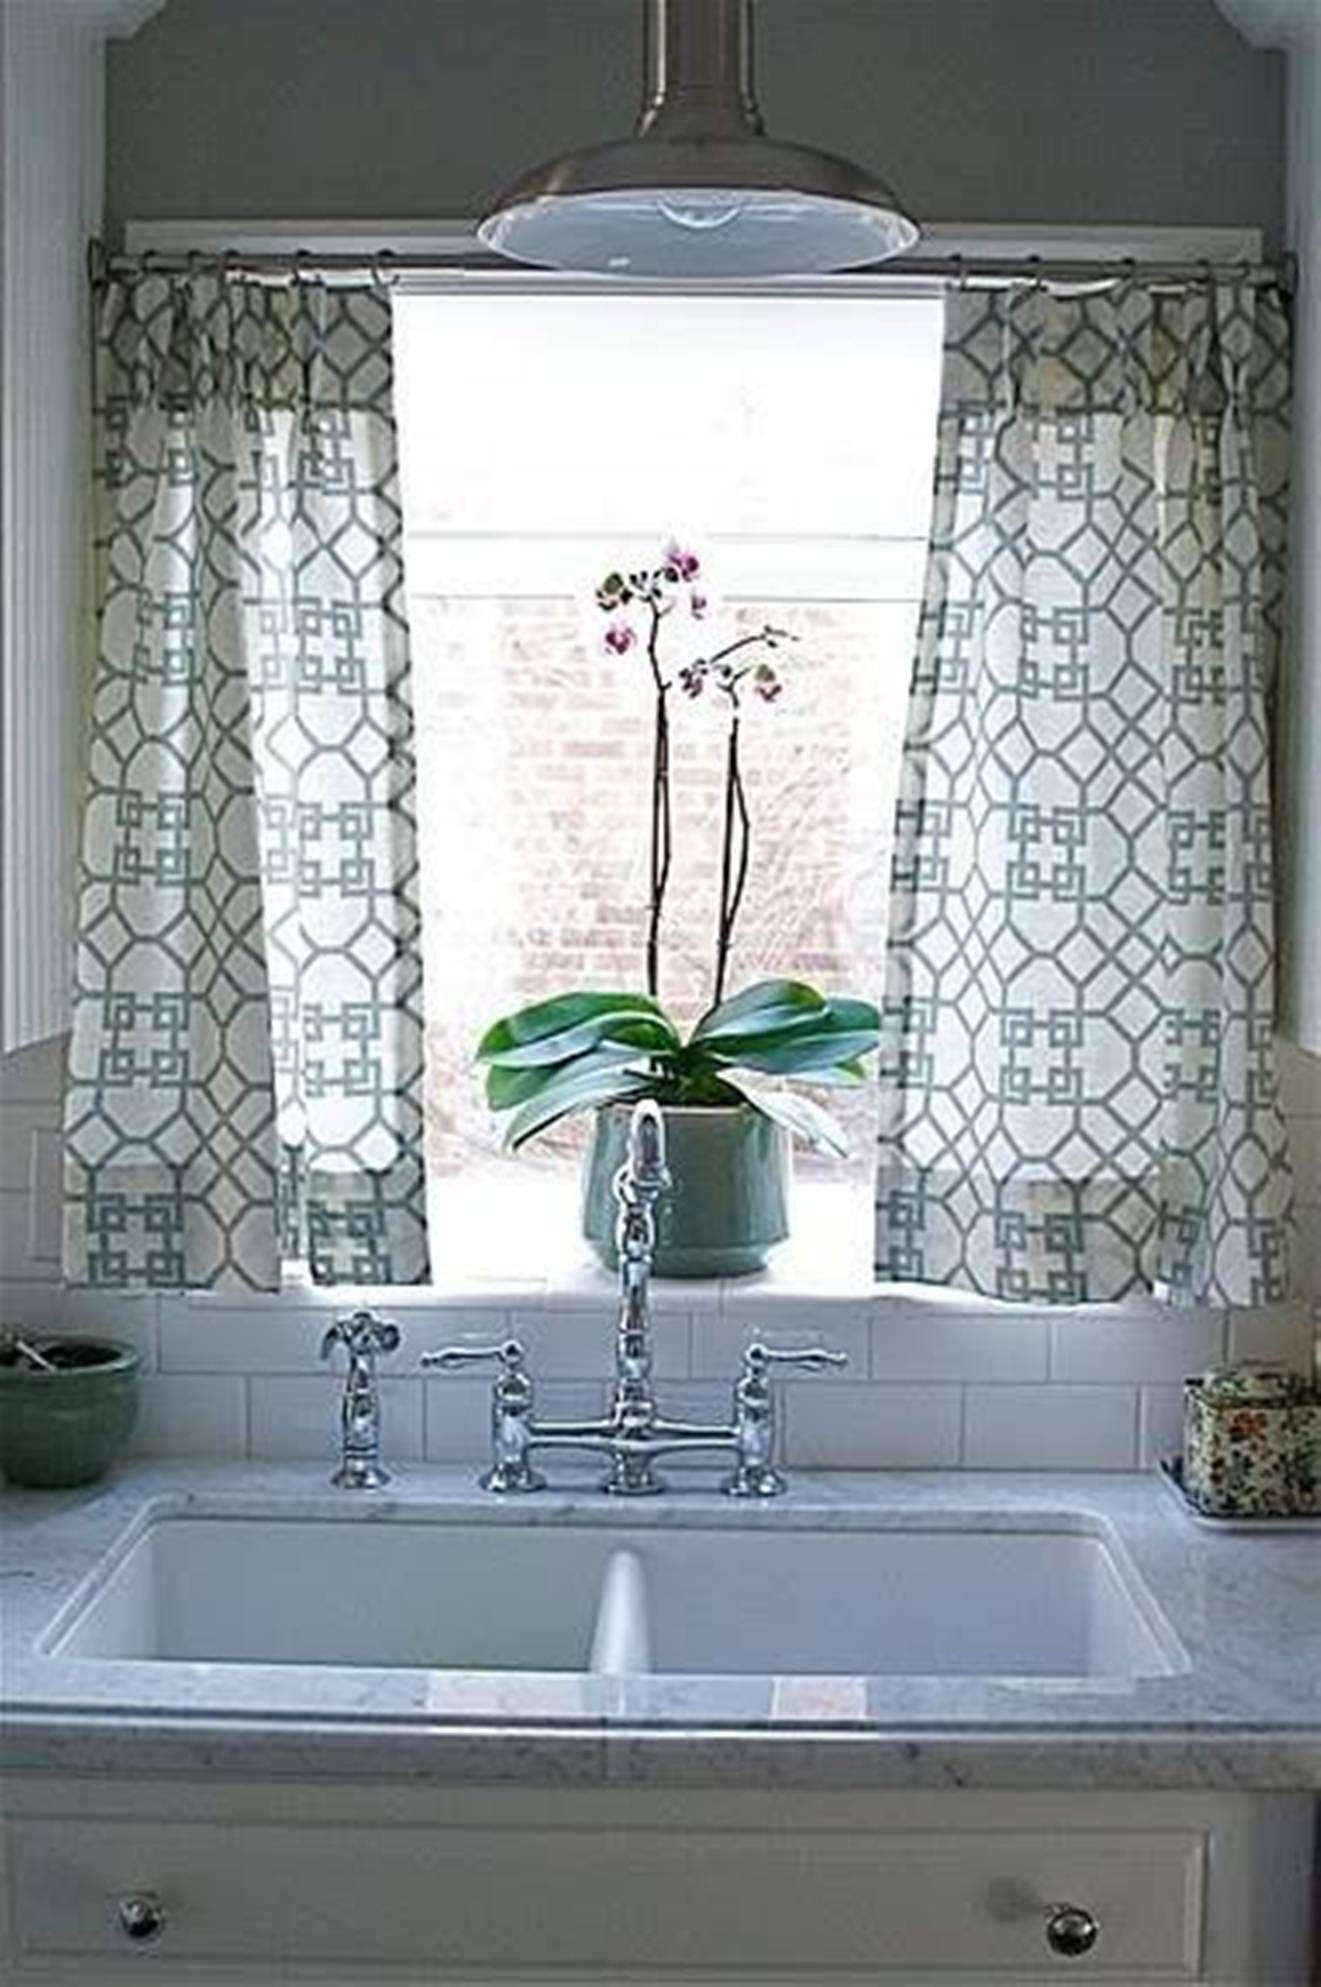 Kitchen Curtain Ideas Kitchen window curtains, Grey